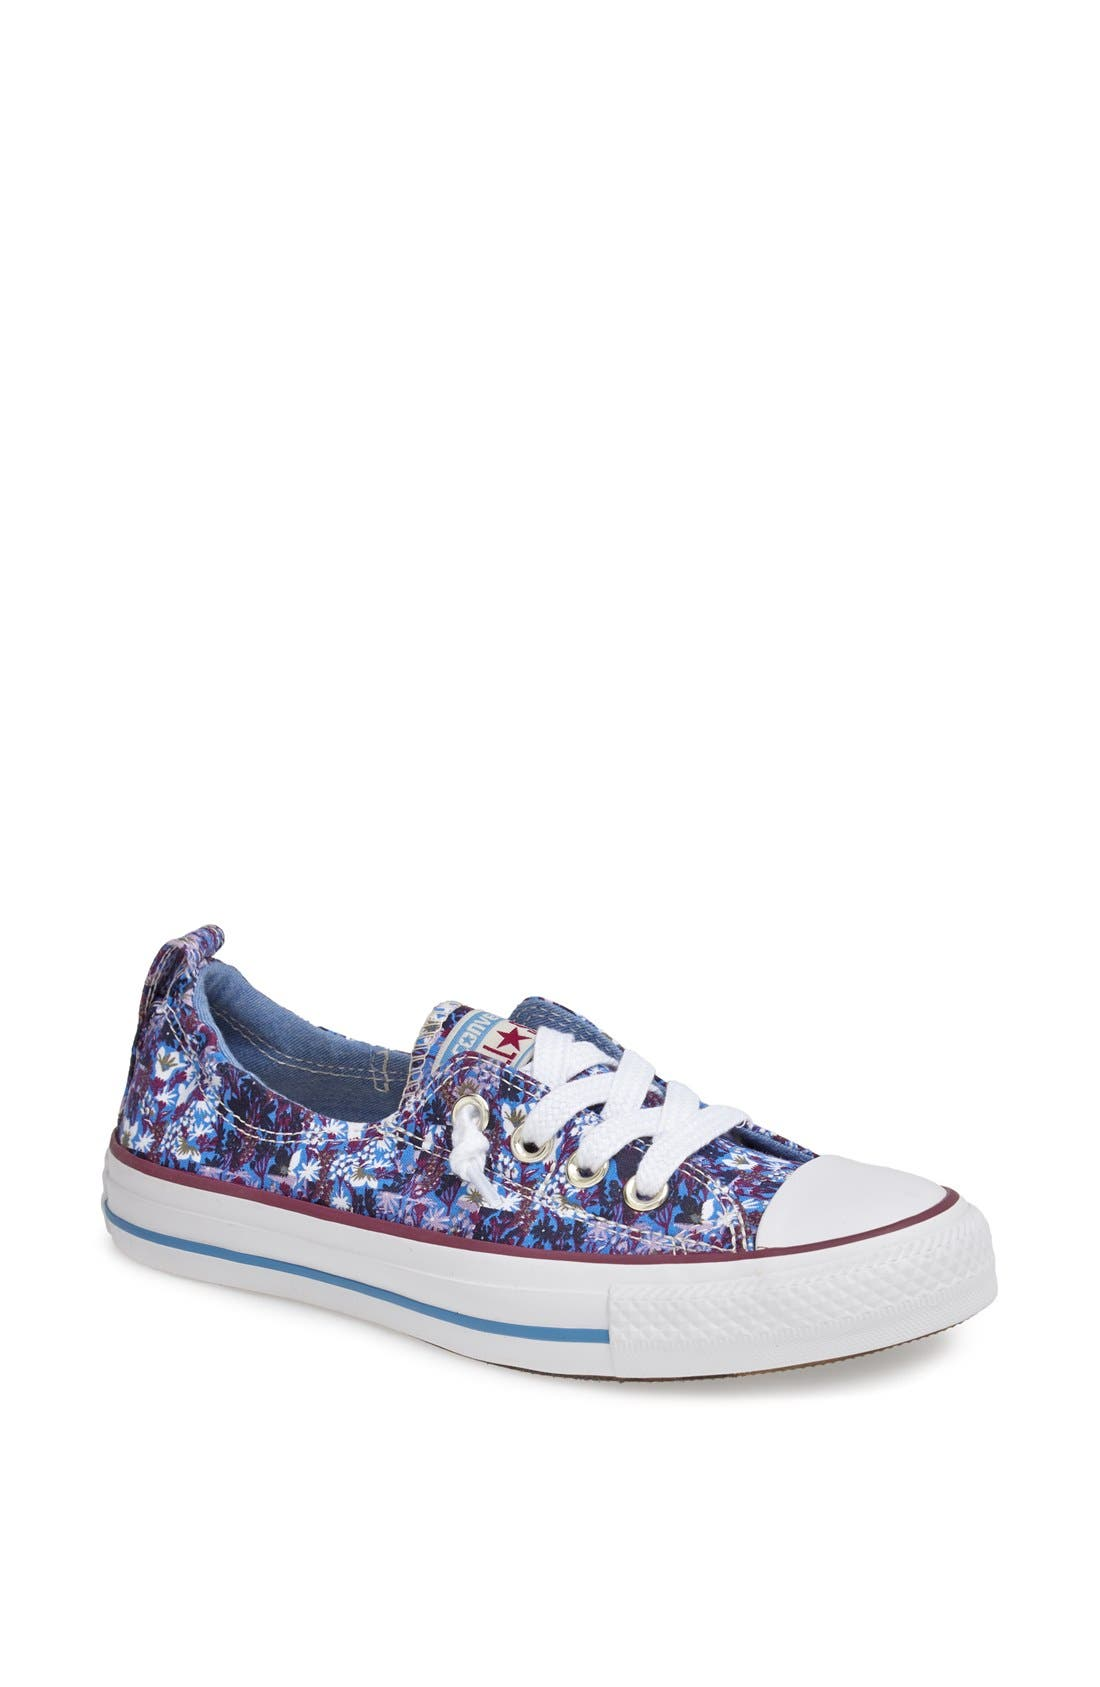 Main Image - Converse Chuck Taylor® 'Shoreline' Flower Print Sneaker (Women)